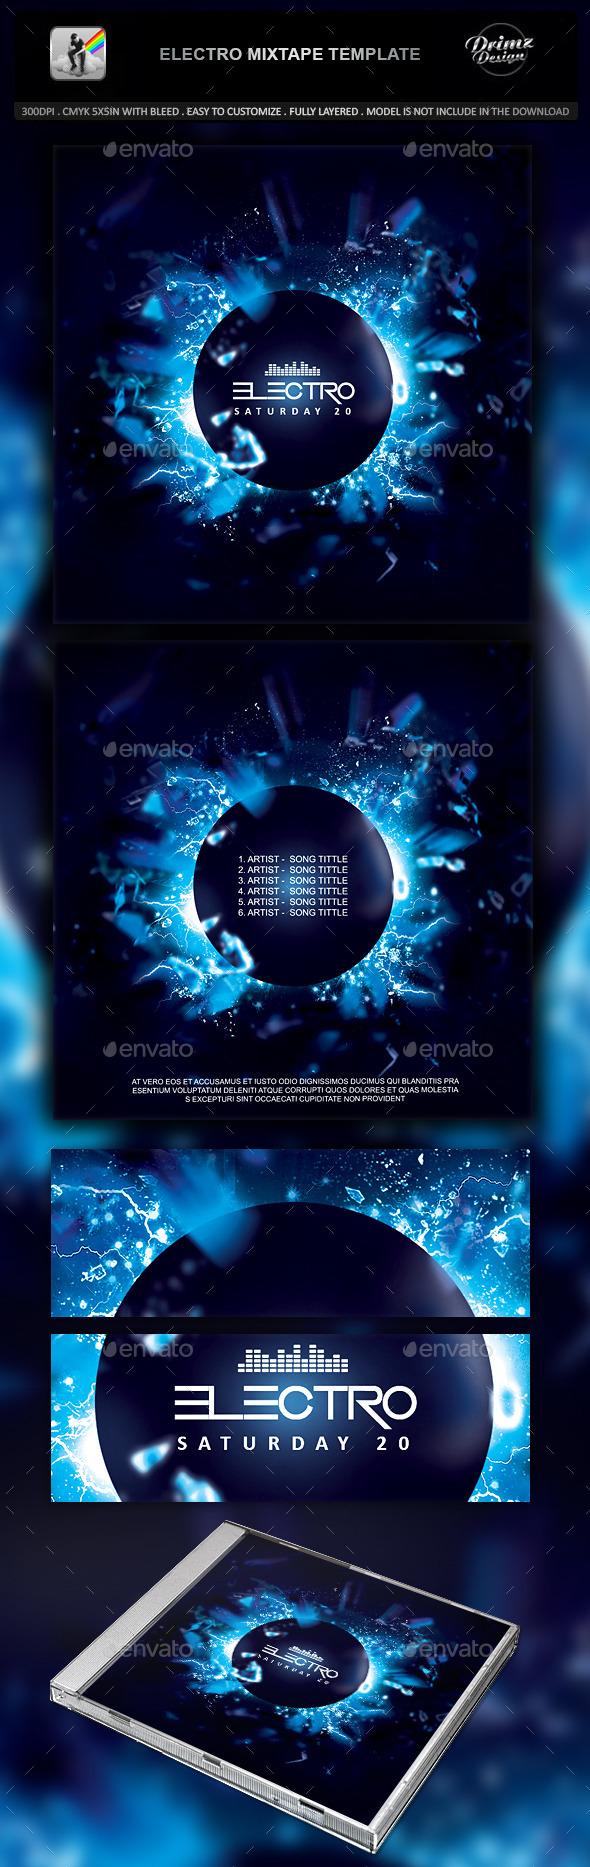 Electro Mixtape Template - CD & DVD Artwork Print Templates